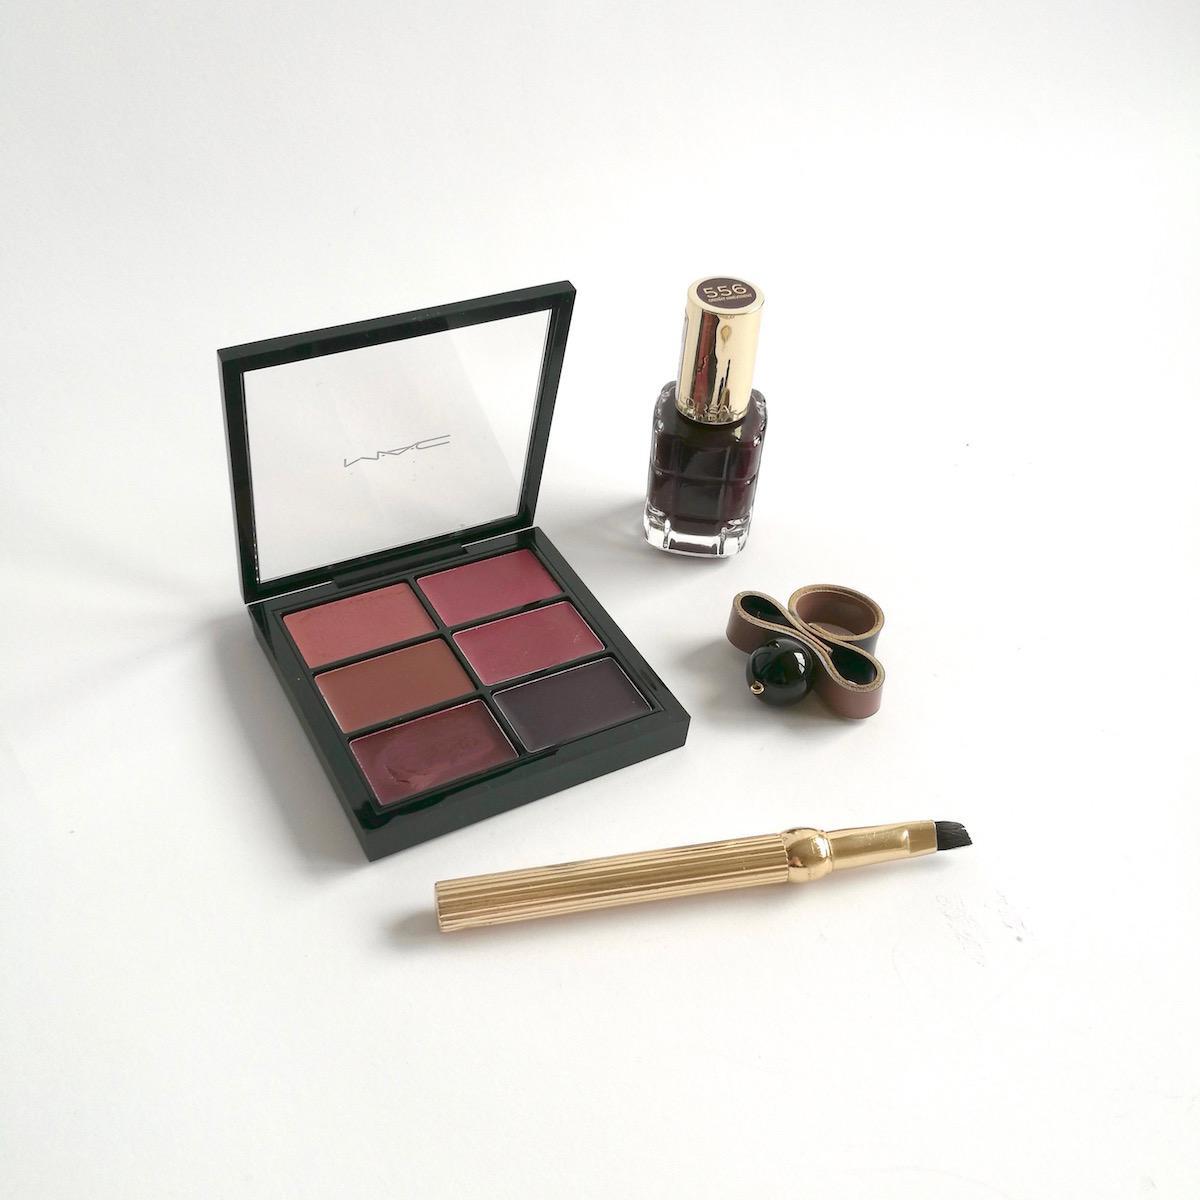 Beautyfullblog makeup licenje Loreal mac